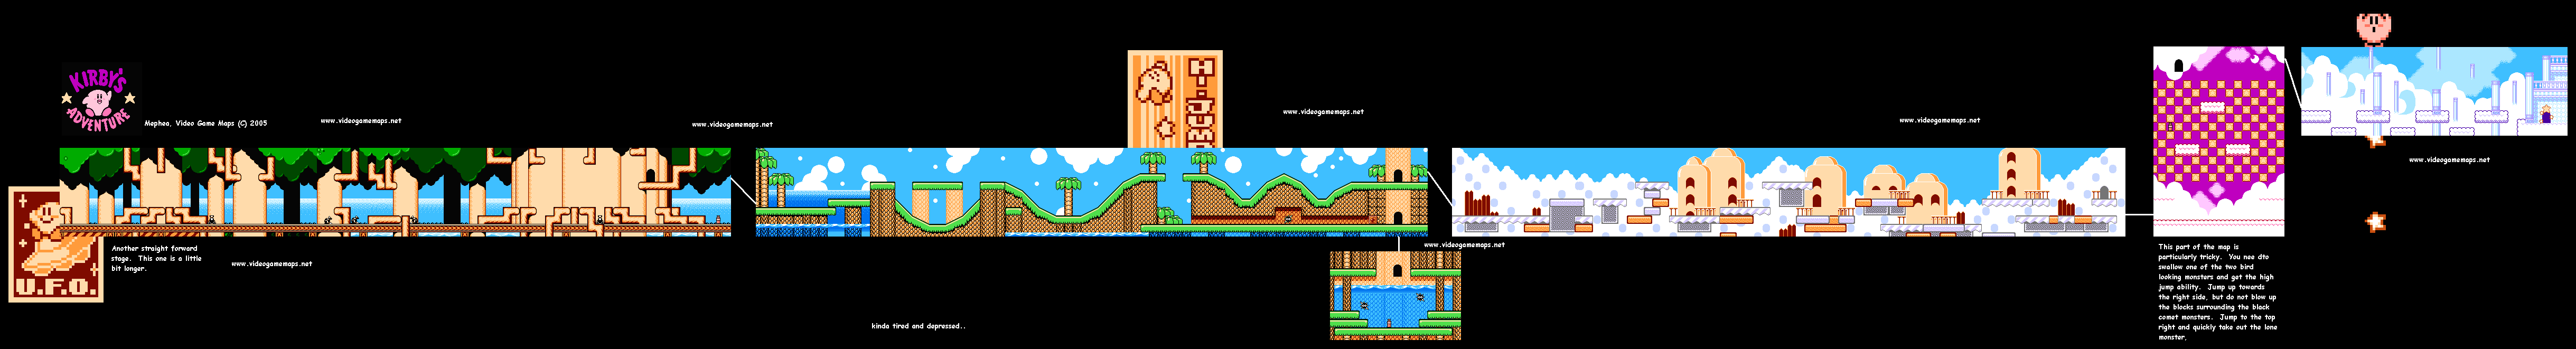 VGM: Maps and Strategies! Kirby Dreamland World Map on kirby's dreamland map, super mario world 2 map, lovecraft h.p. lovecraft world map,